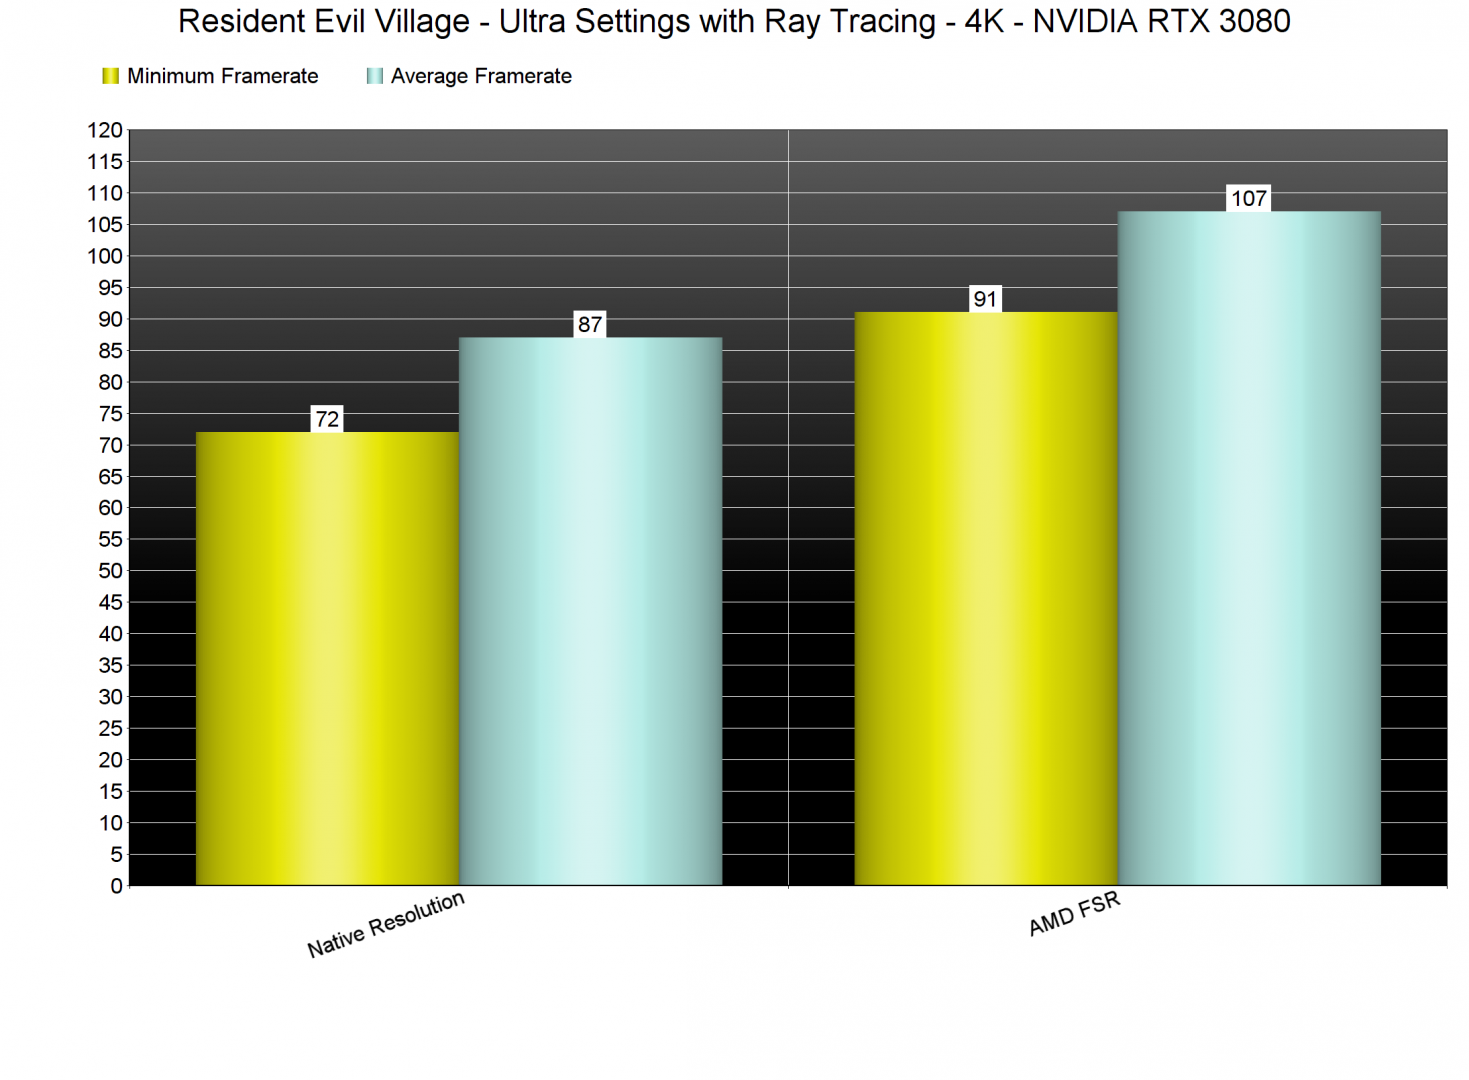 Resident Evil Village Native vs AMD FSR benchmarks